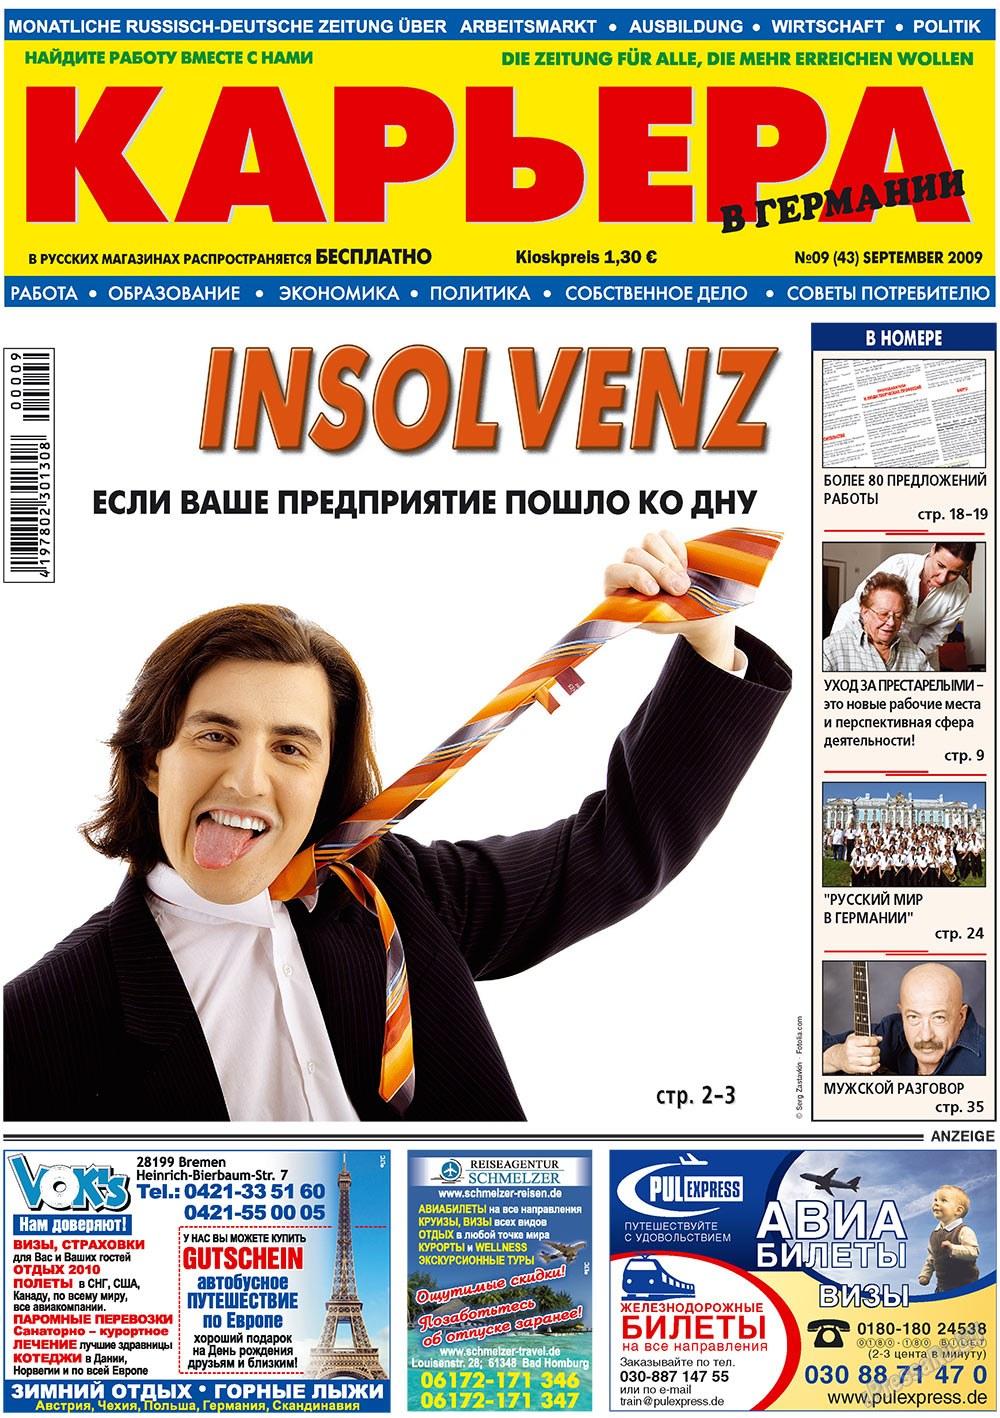 Карьера (газета). 2009 год, номер 9, стр. 1